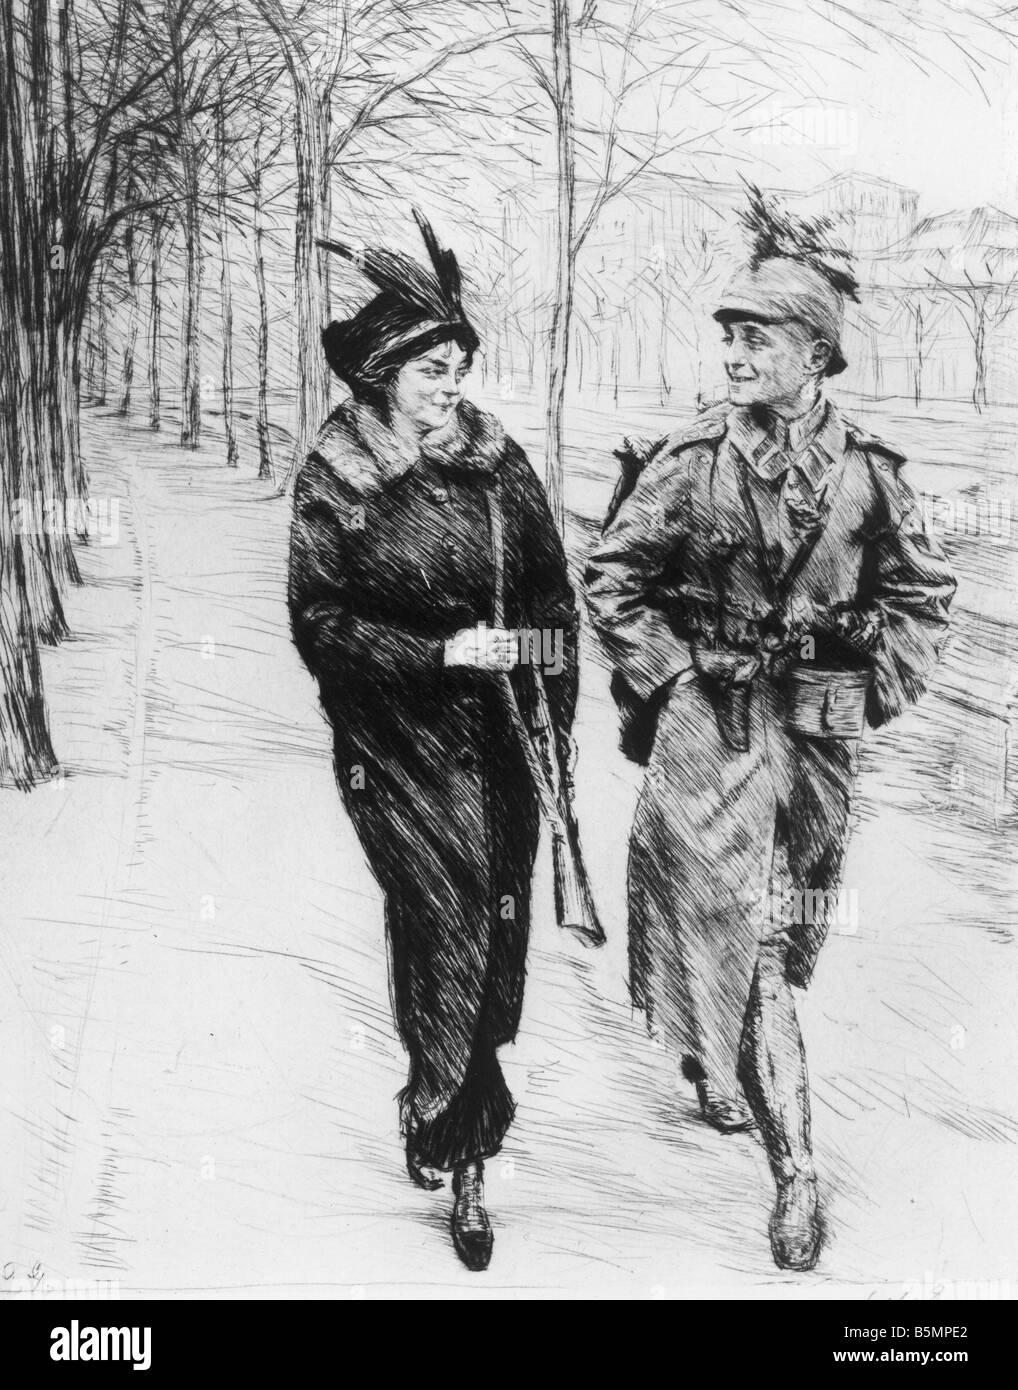 O To Ww Bing Com1 Microsoft W: 9 1914 8 1 A4 WW1 War Volunteer Etching O Goetze World War